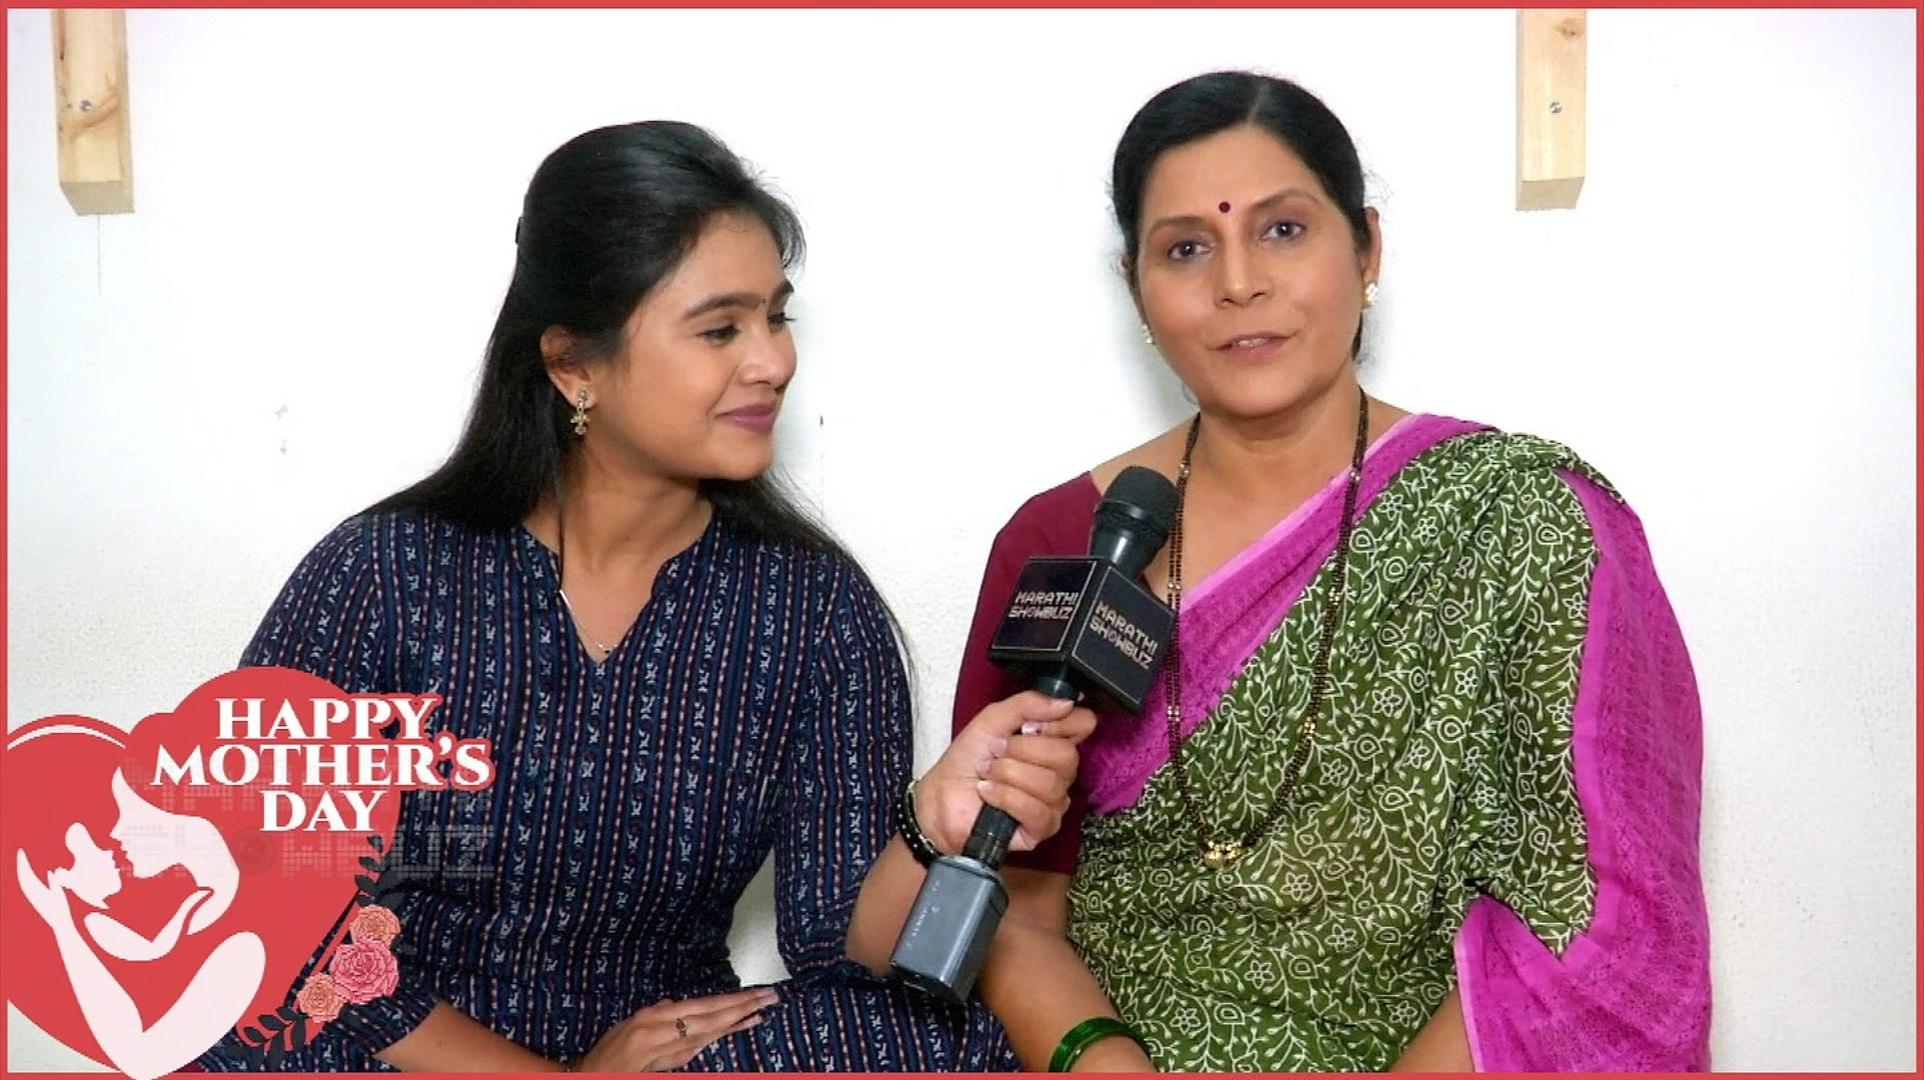 Mother's Day Special He Maan Baware | मृणाल आणि आईची Off Screen केमिस्ट्री  | Mrunal Dhusanis